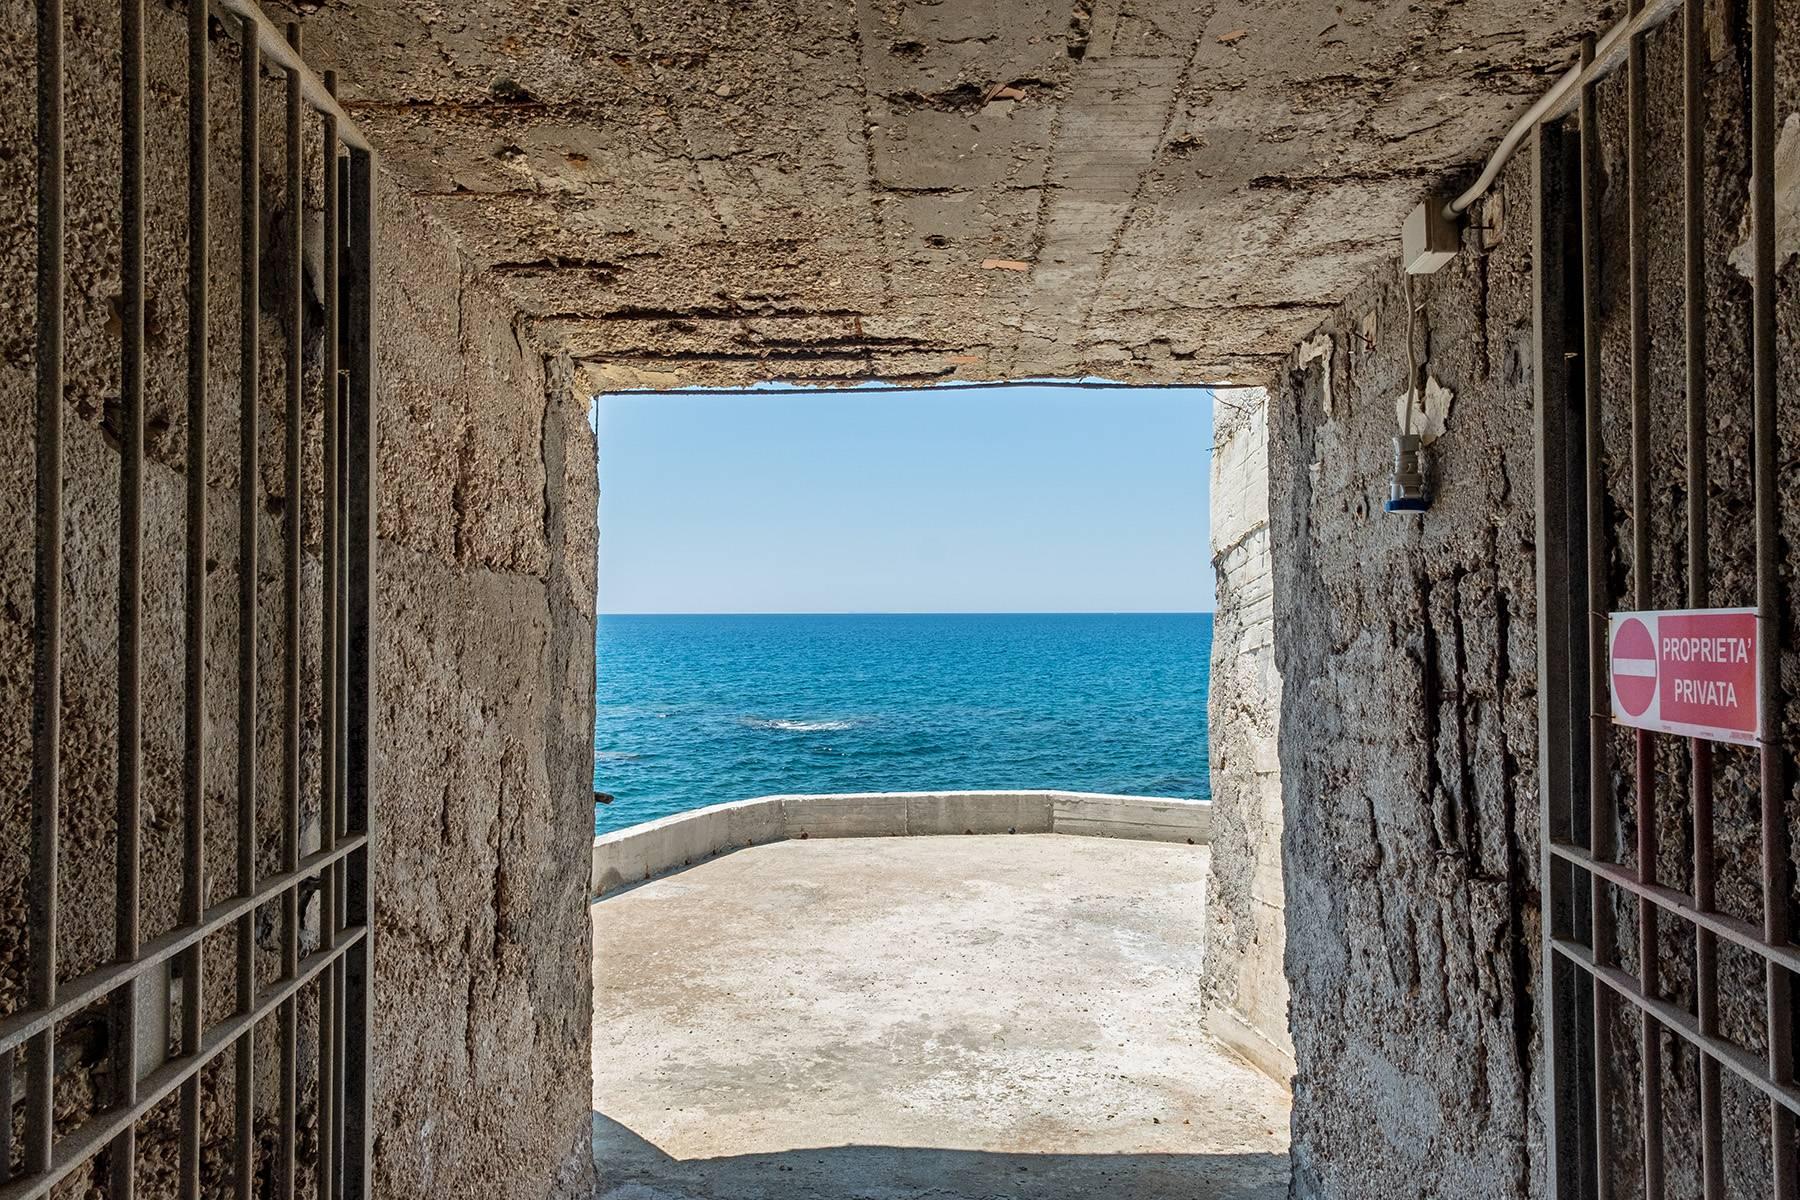 Villa in Vendita a Ischia: 5 locali, 400 mq - Foto 12